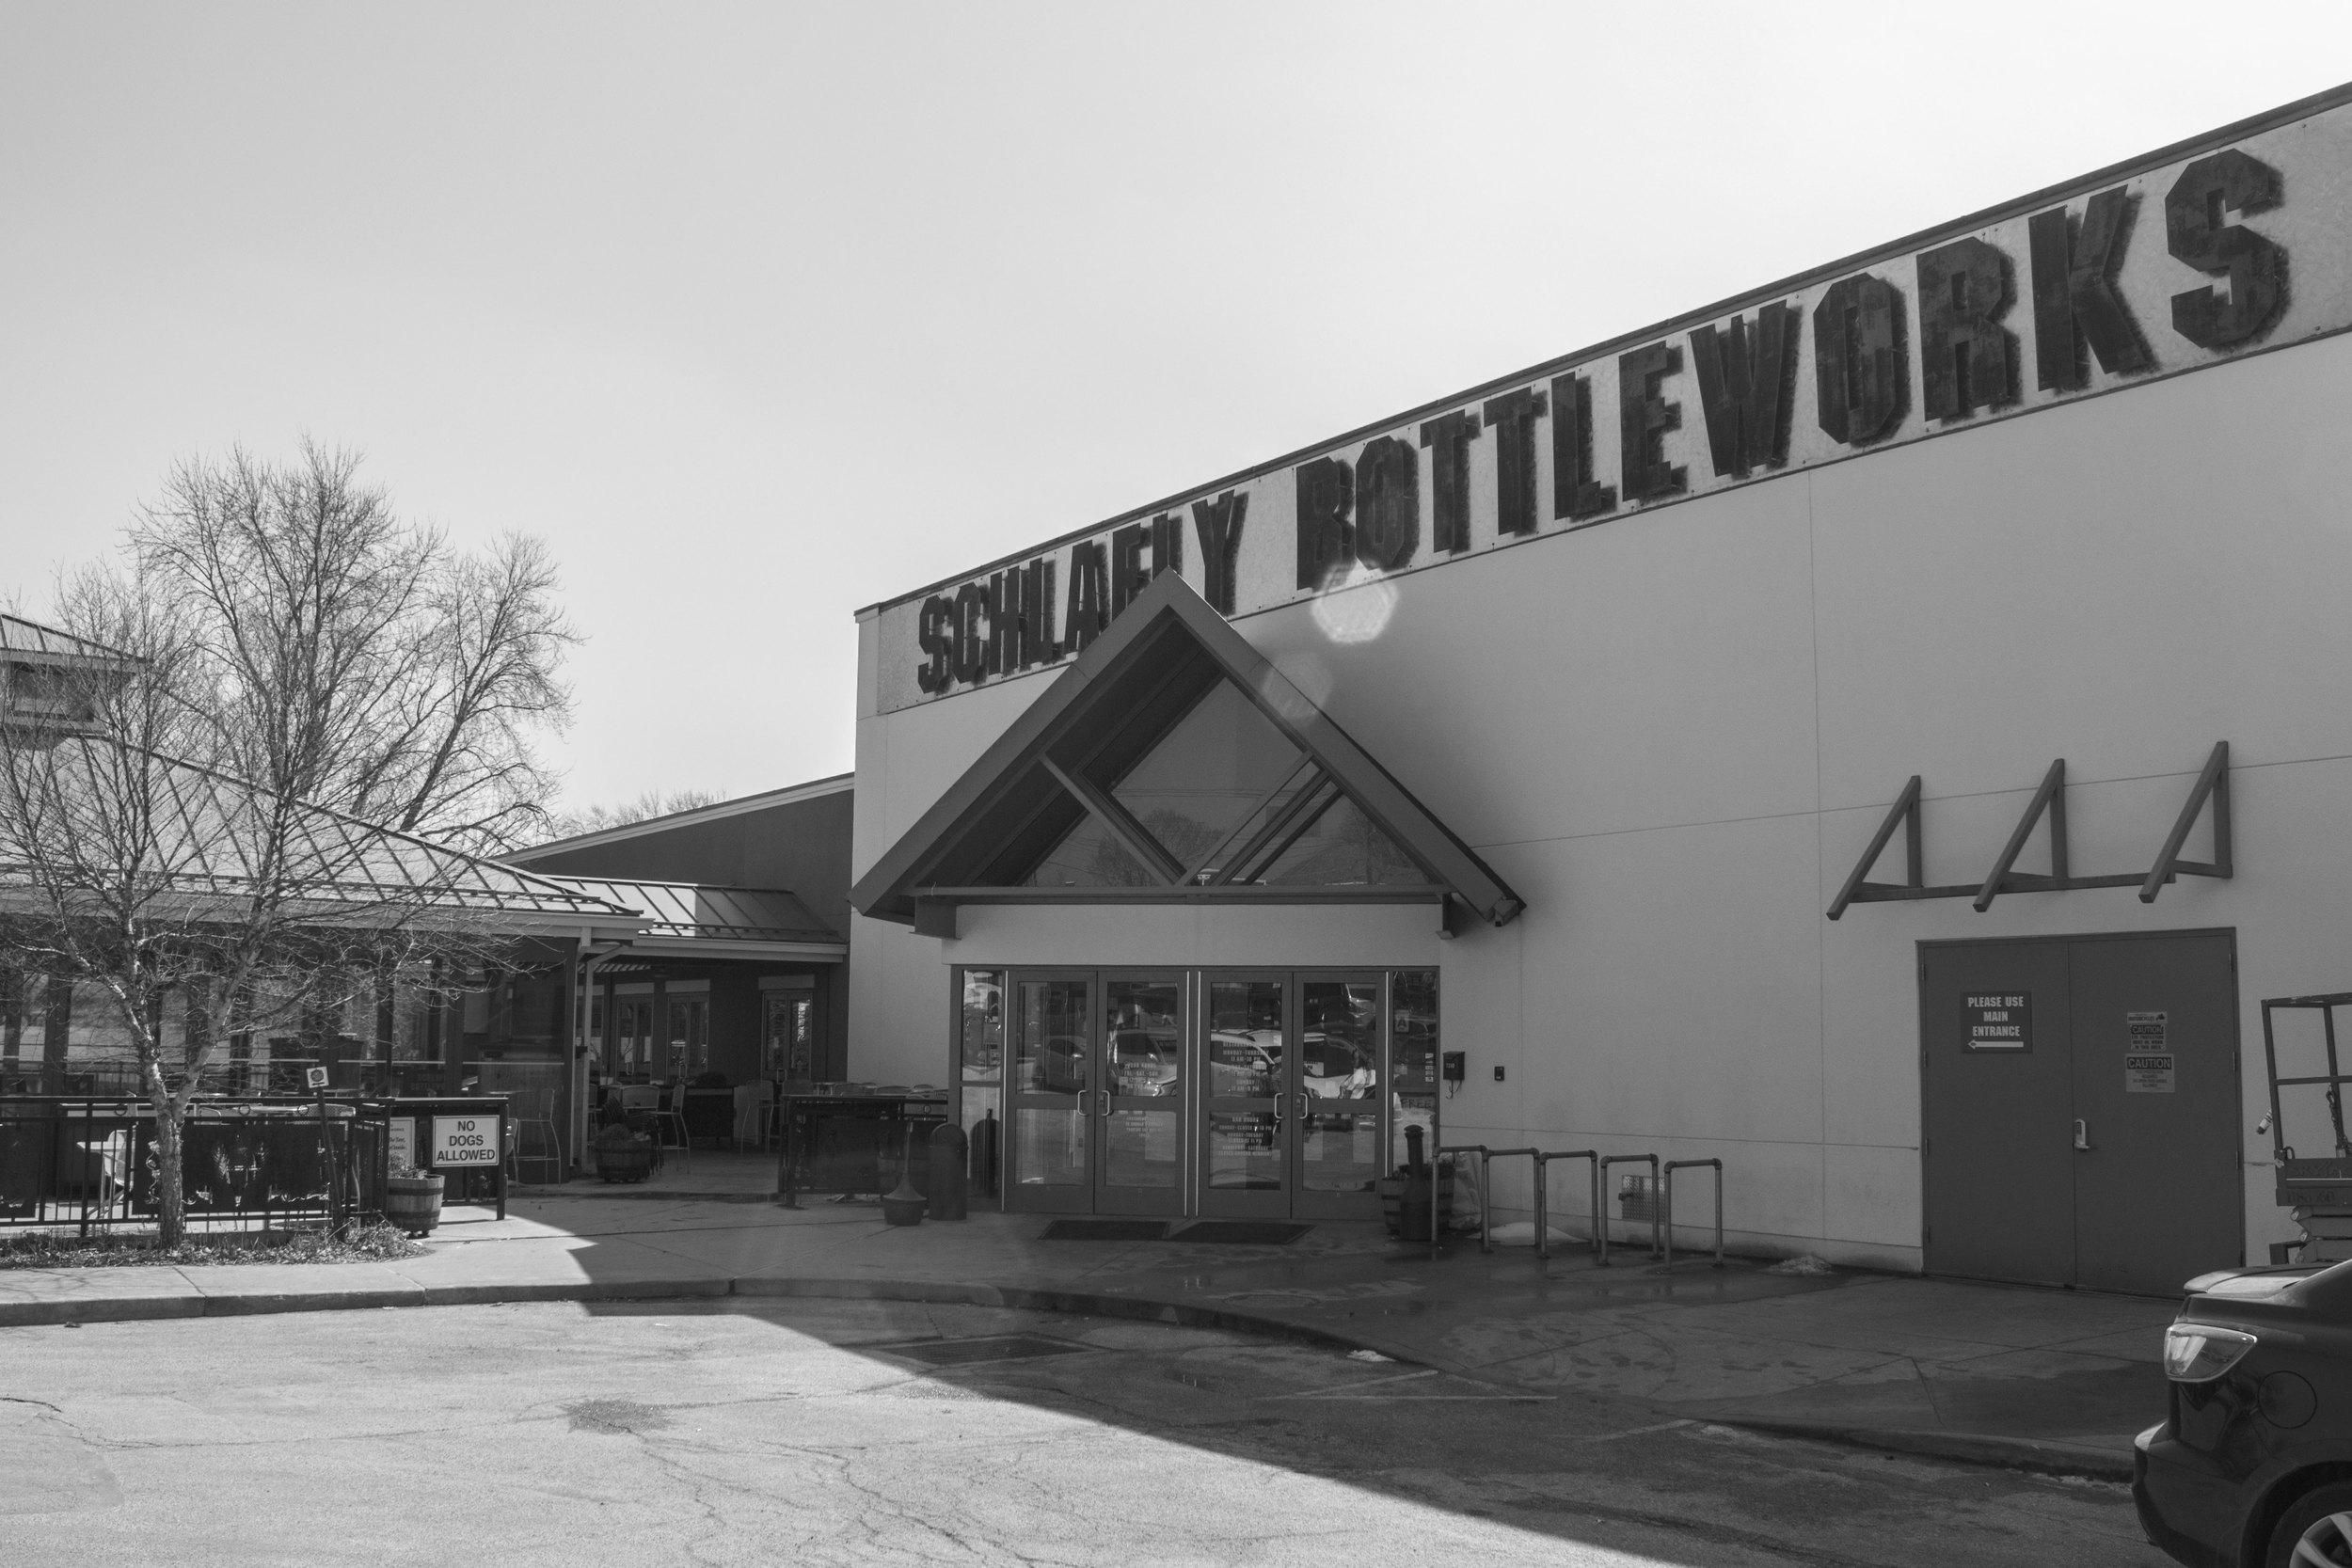 Schlafly-Front.jpg